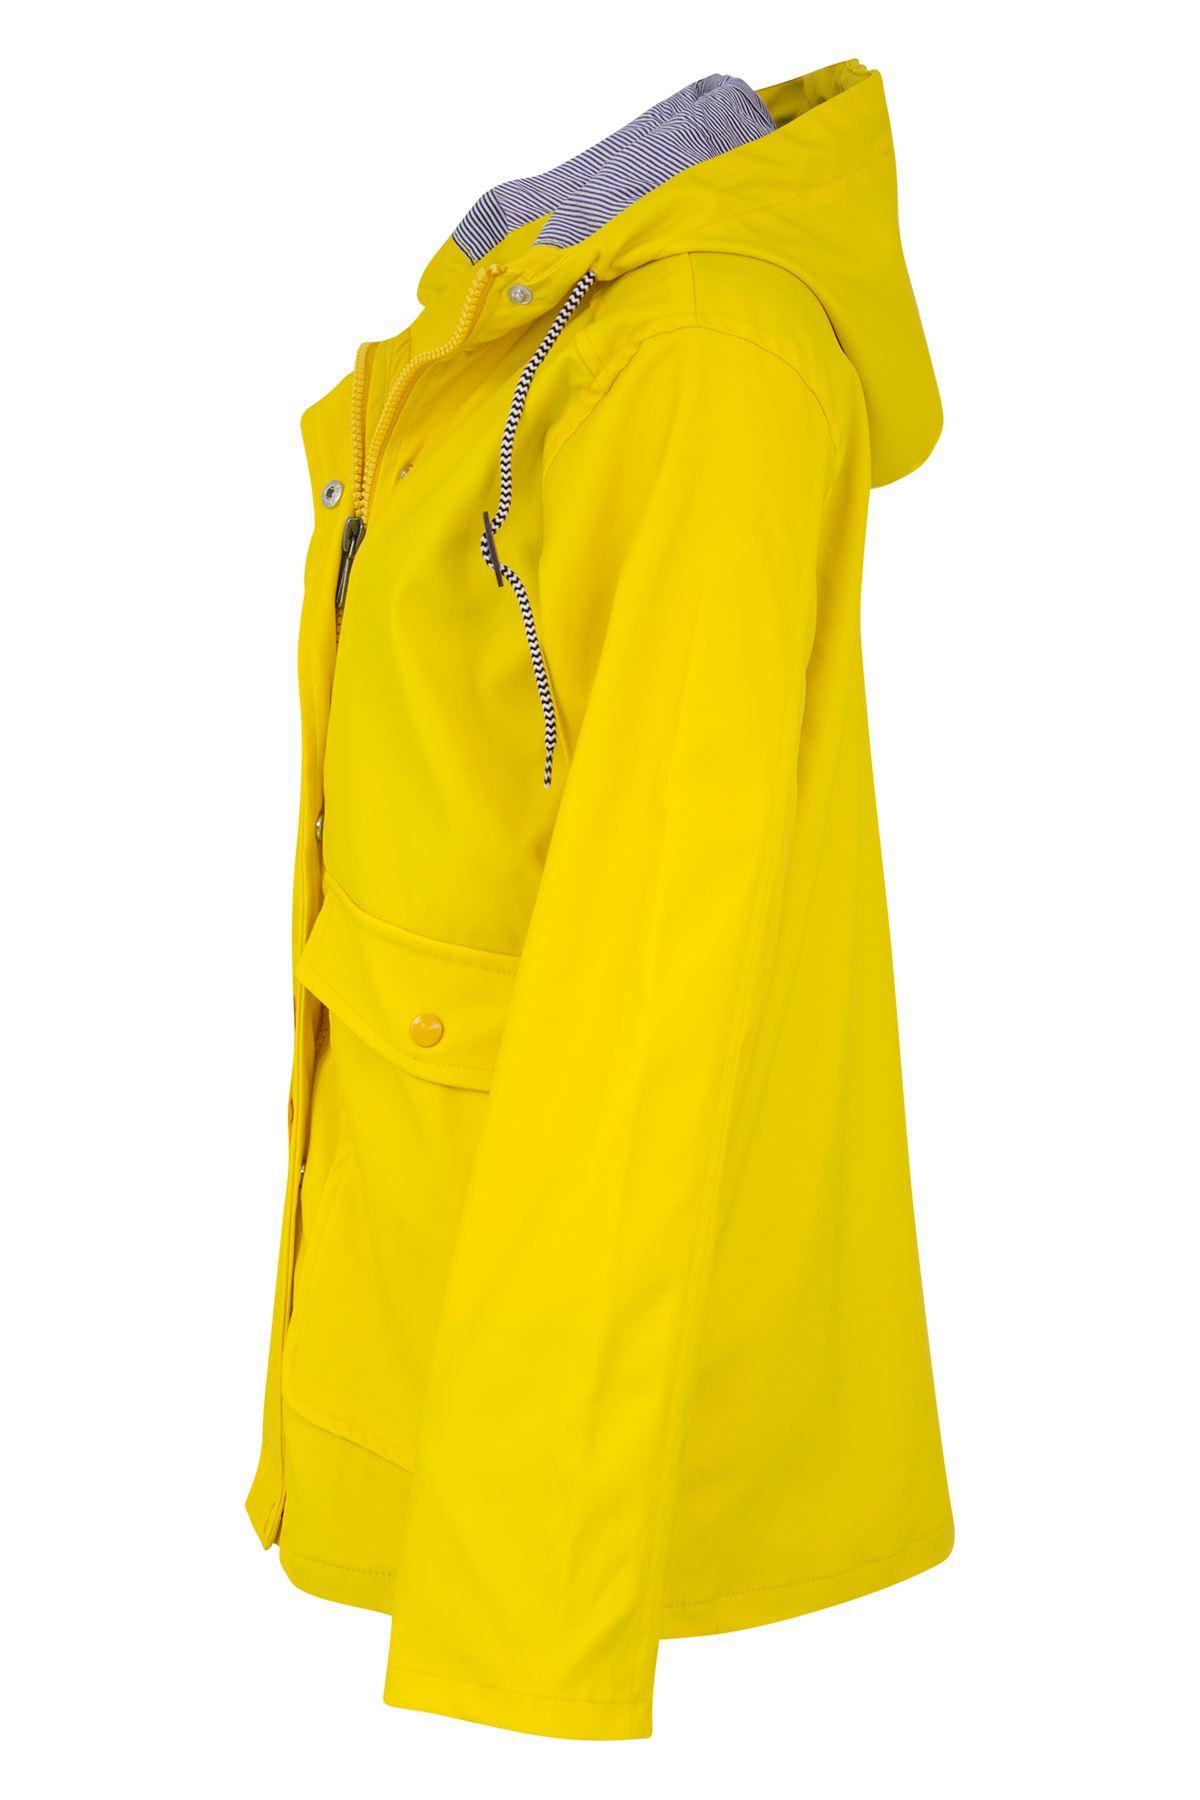 Womens-Ladies-Yellow-Festival-Water-proof-Rain-Outdoor-Mac-Raincoat-Jacket-Size thumbnail 9